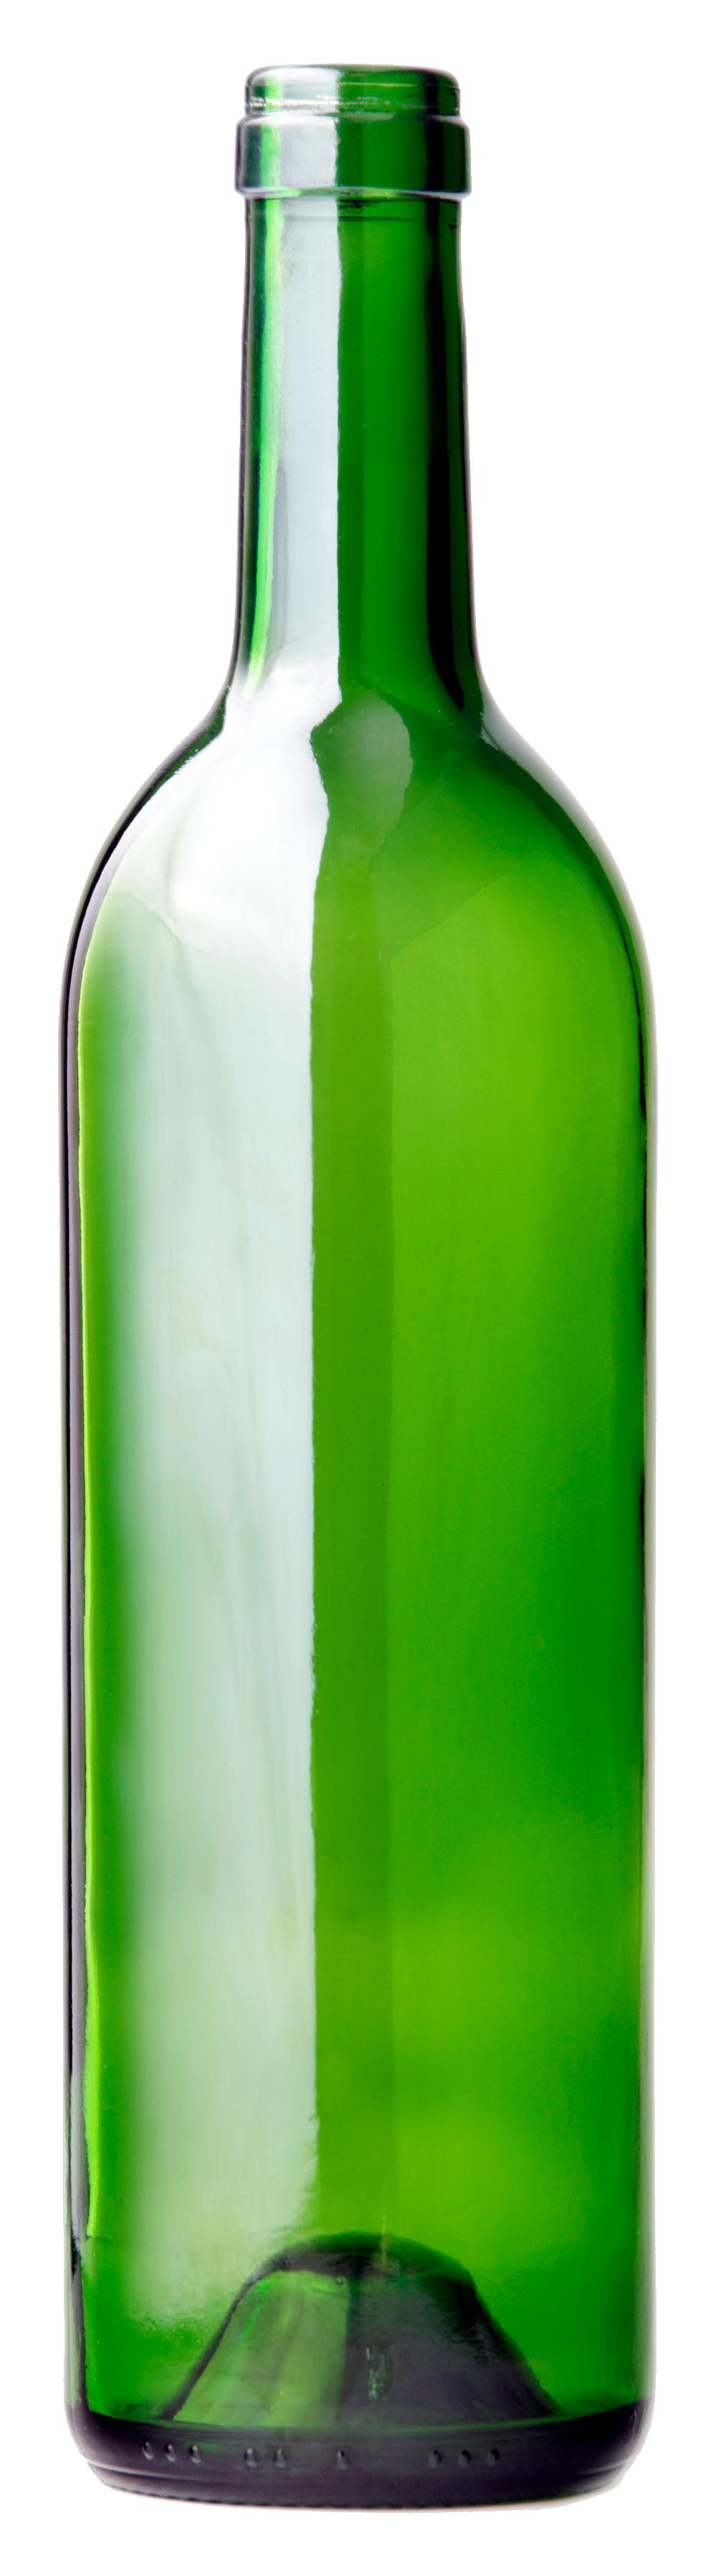 Glass green bottle PNG image - Bottle PNG